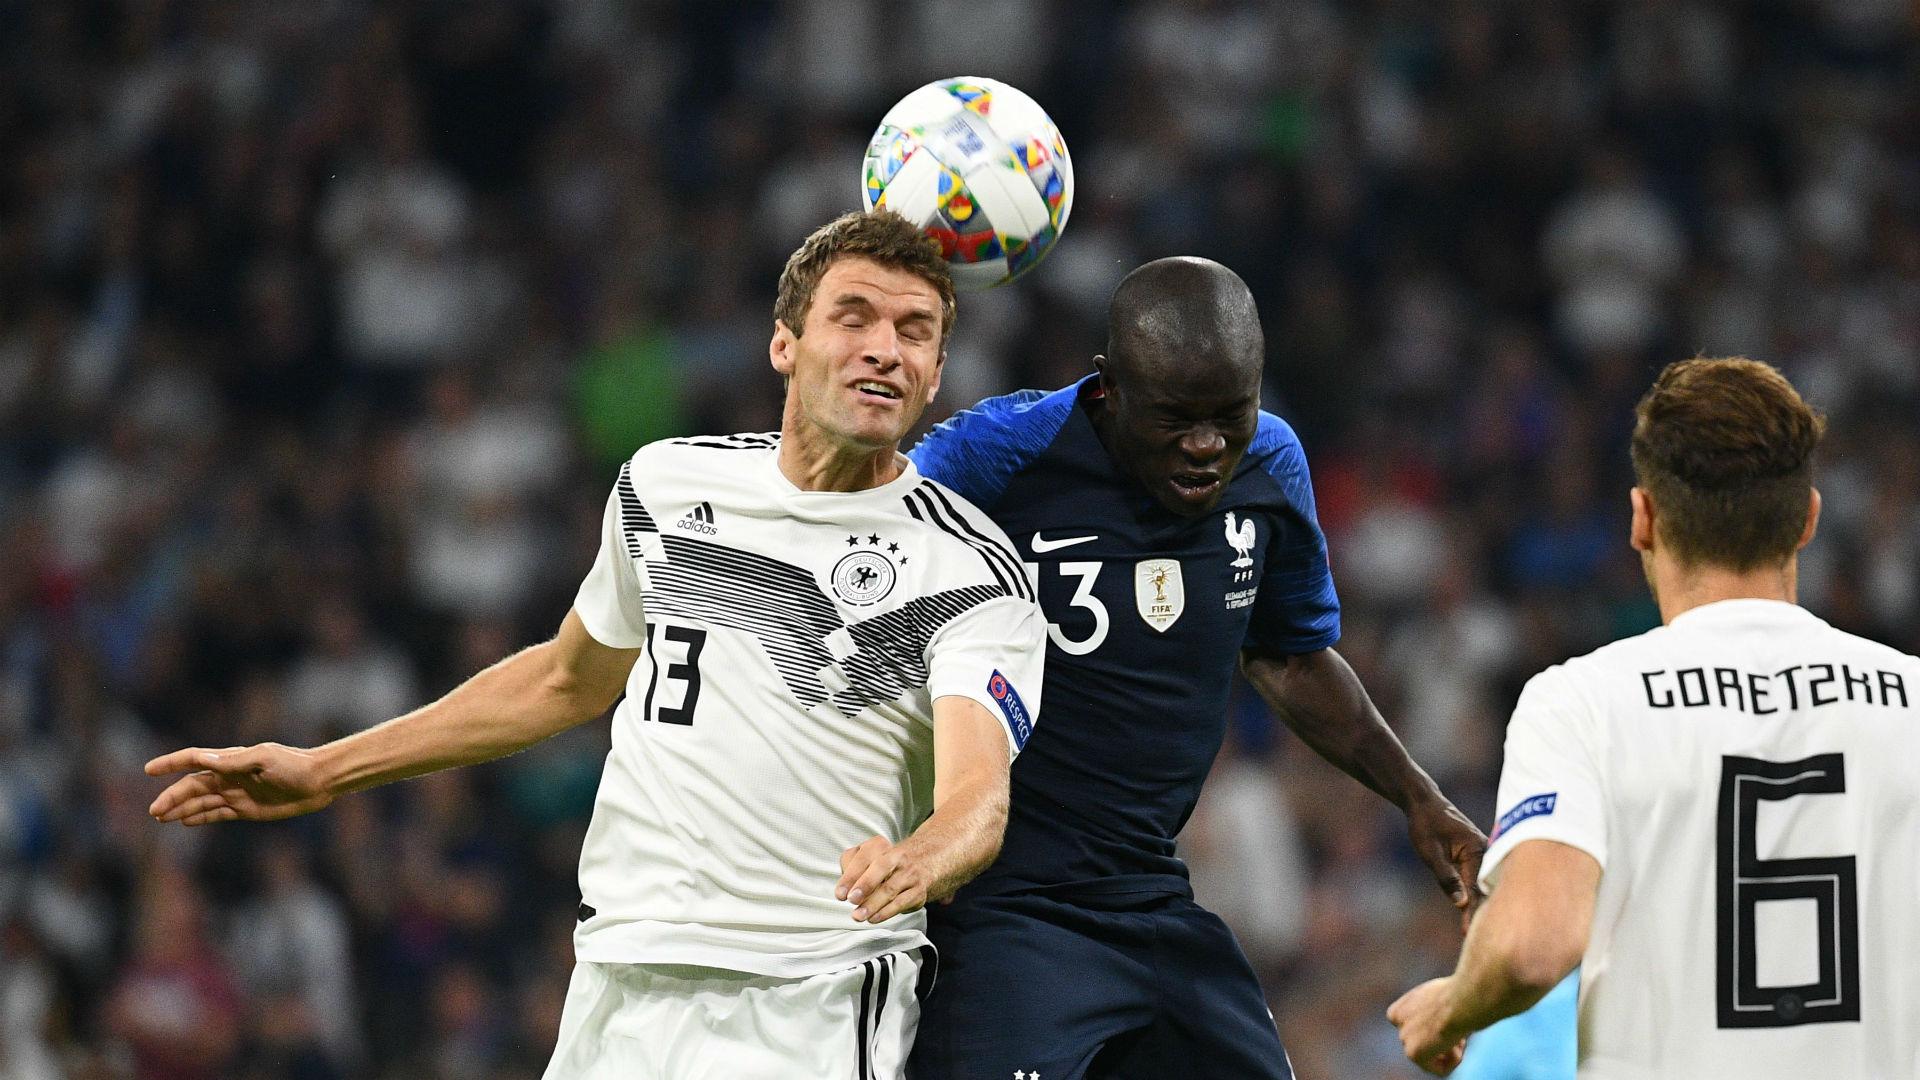 Image result for เยอรมันไม่คมเจ๊าฝรั่งเศส 0-0